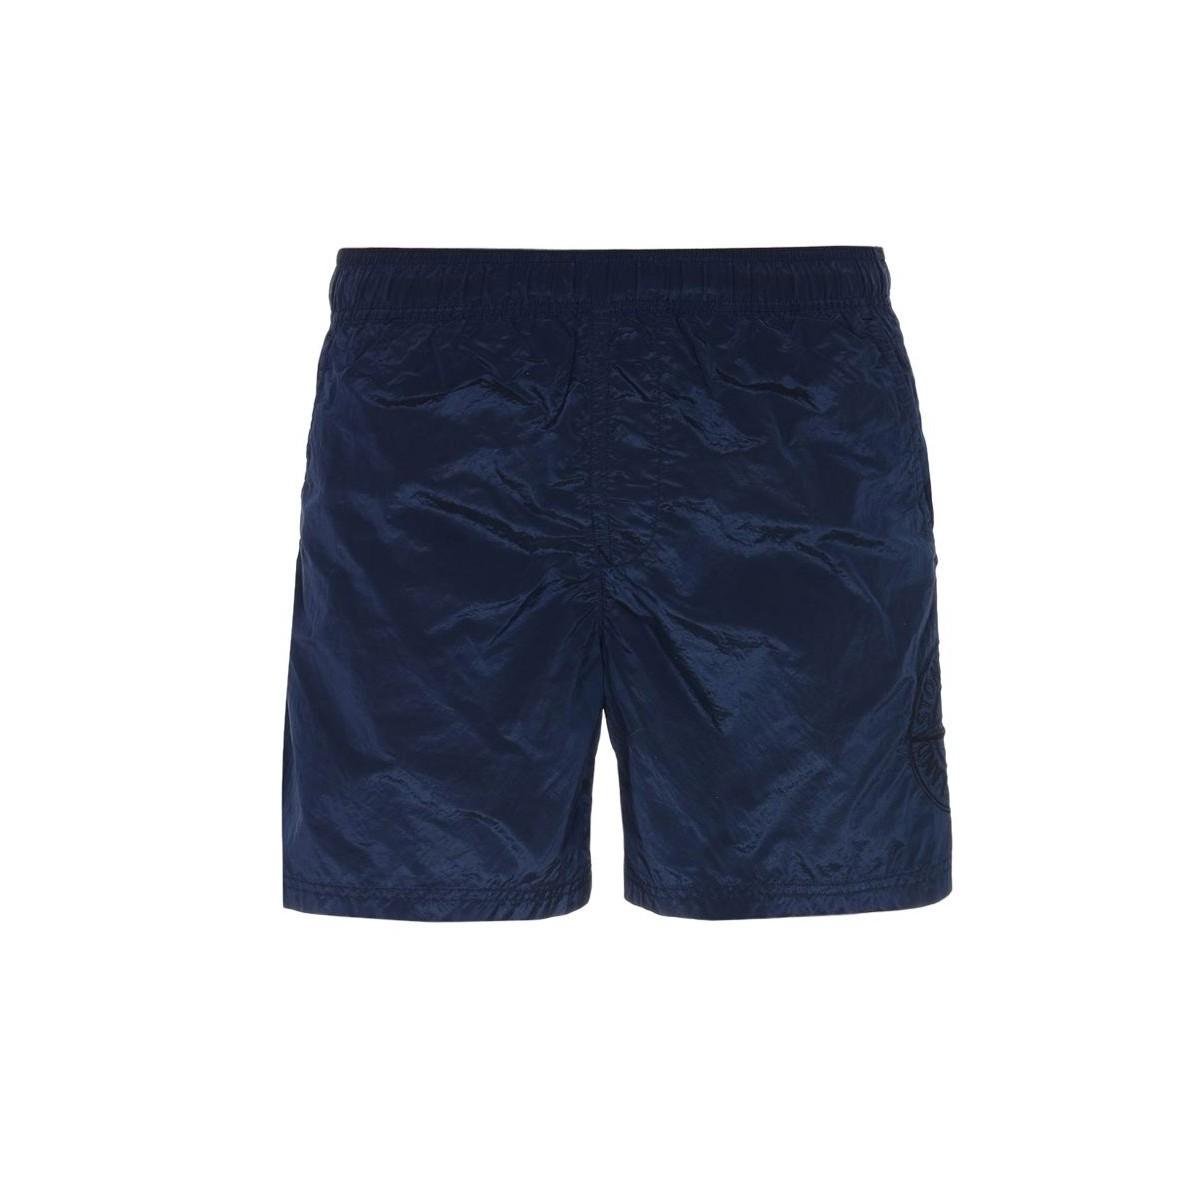 Bermuda - B0943 nylon metal short bagno